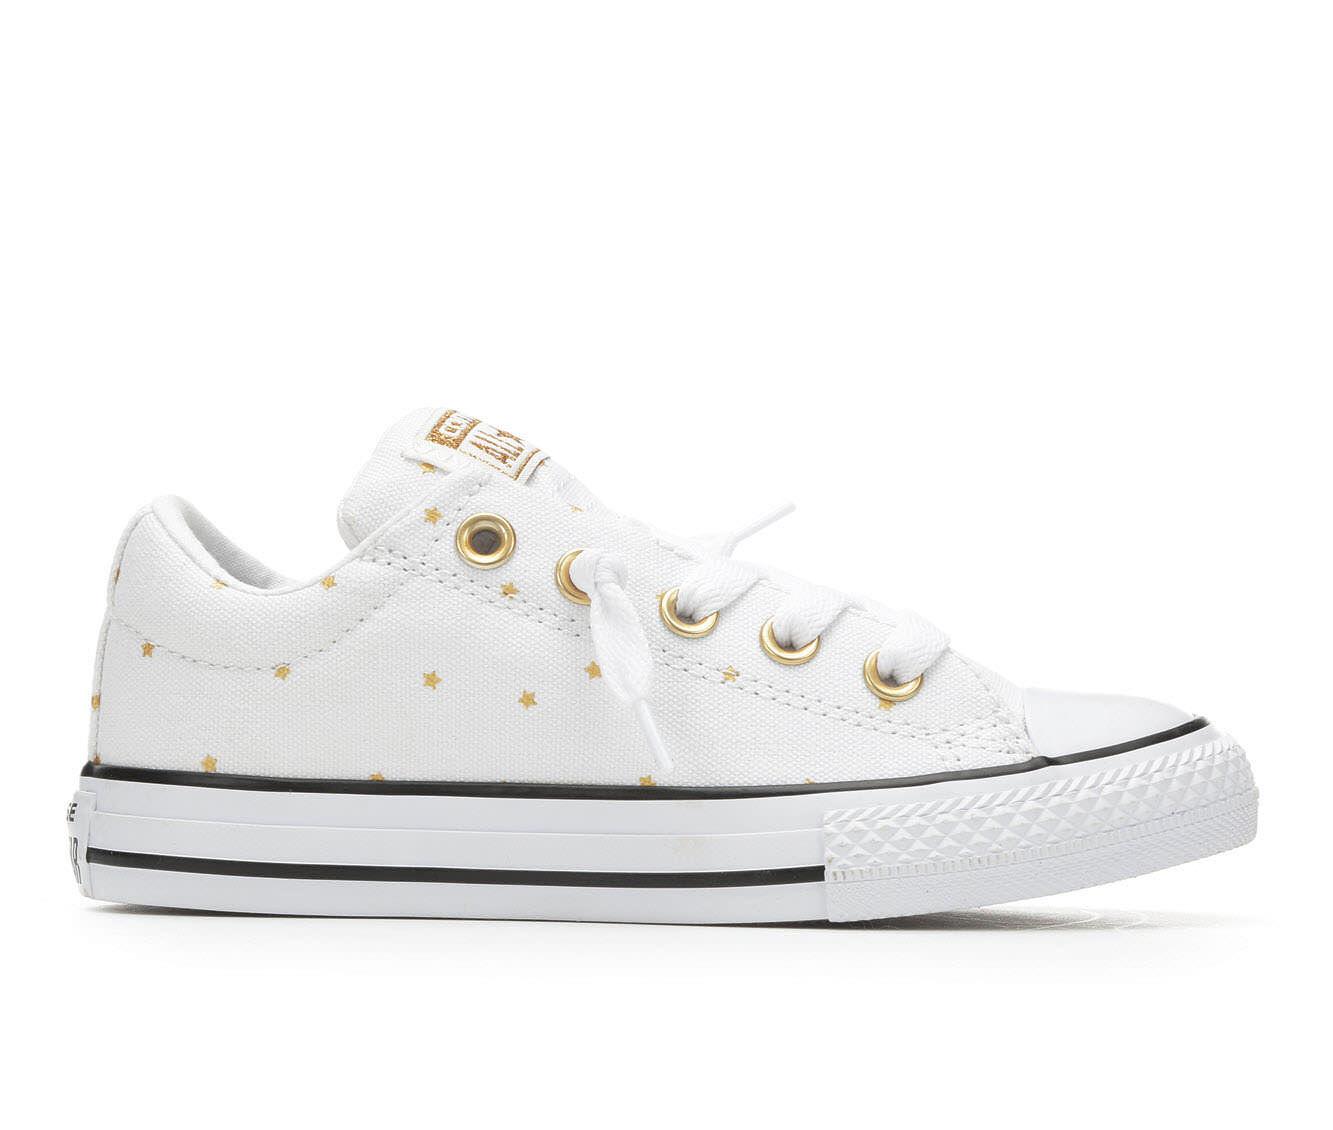 converse chuck taylor all star metallic sneaker